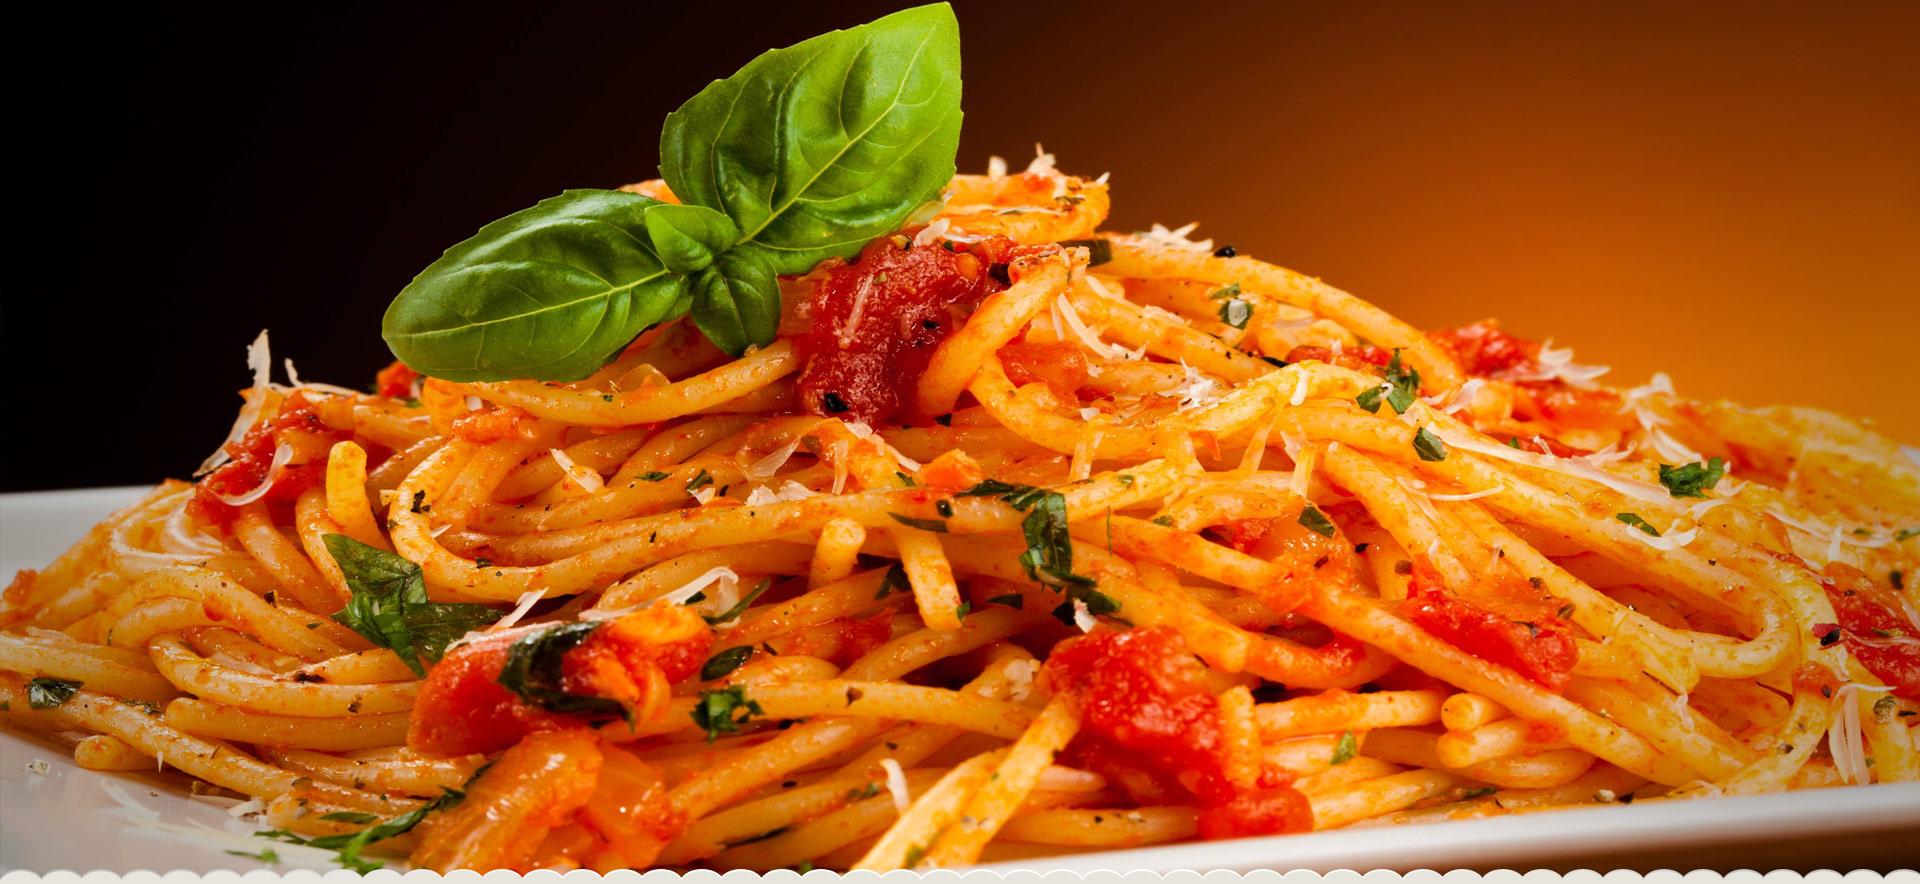 italian-restaurant-pasta